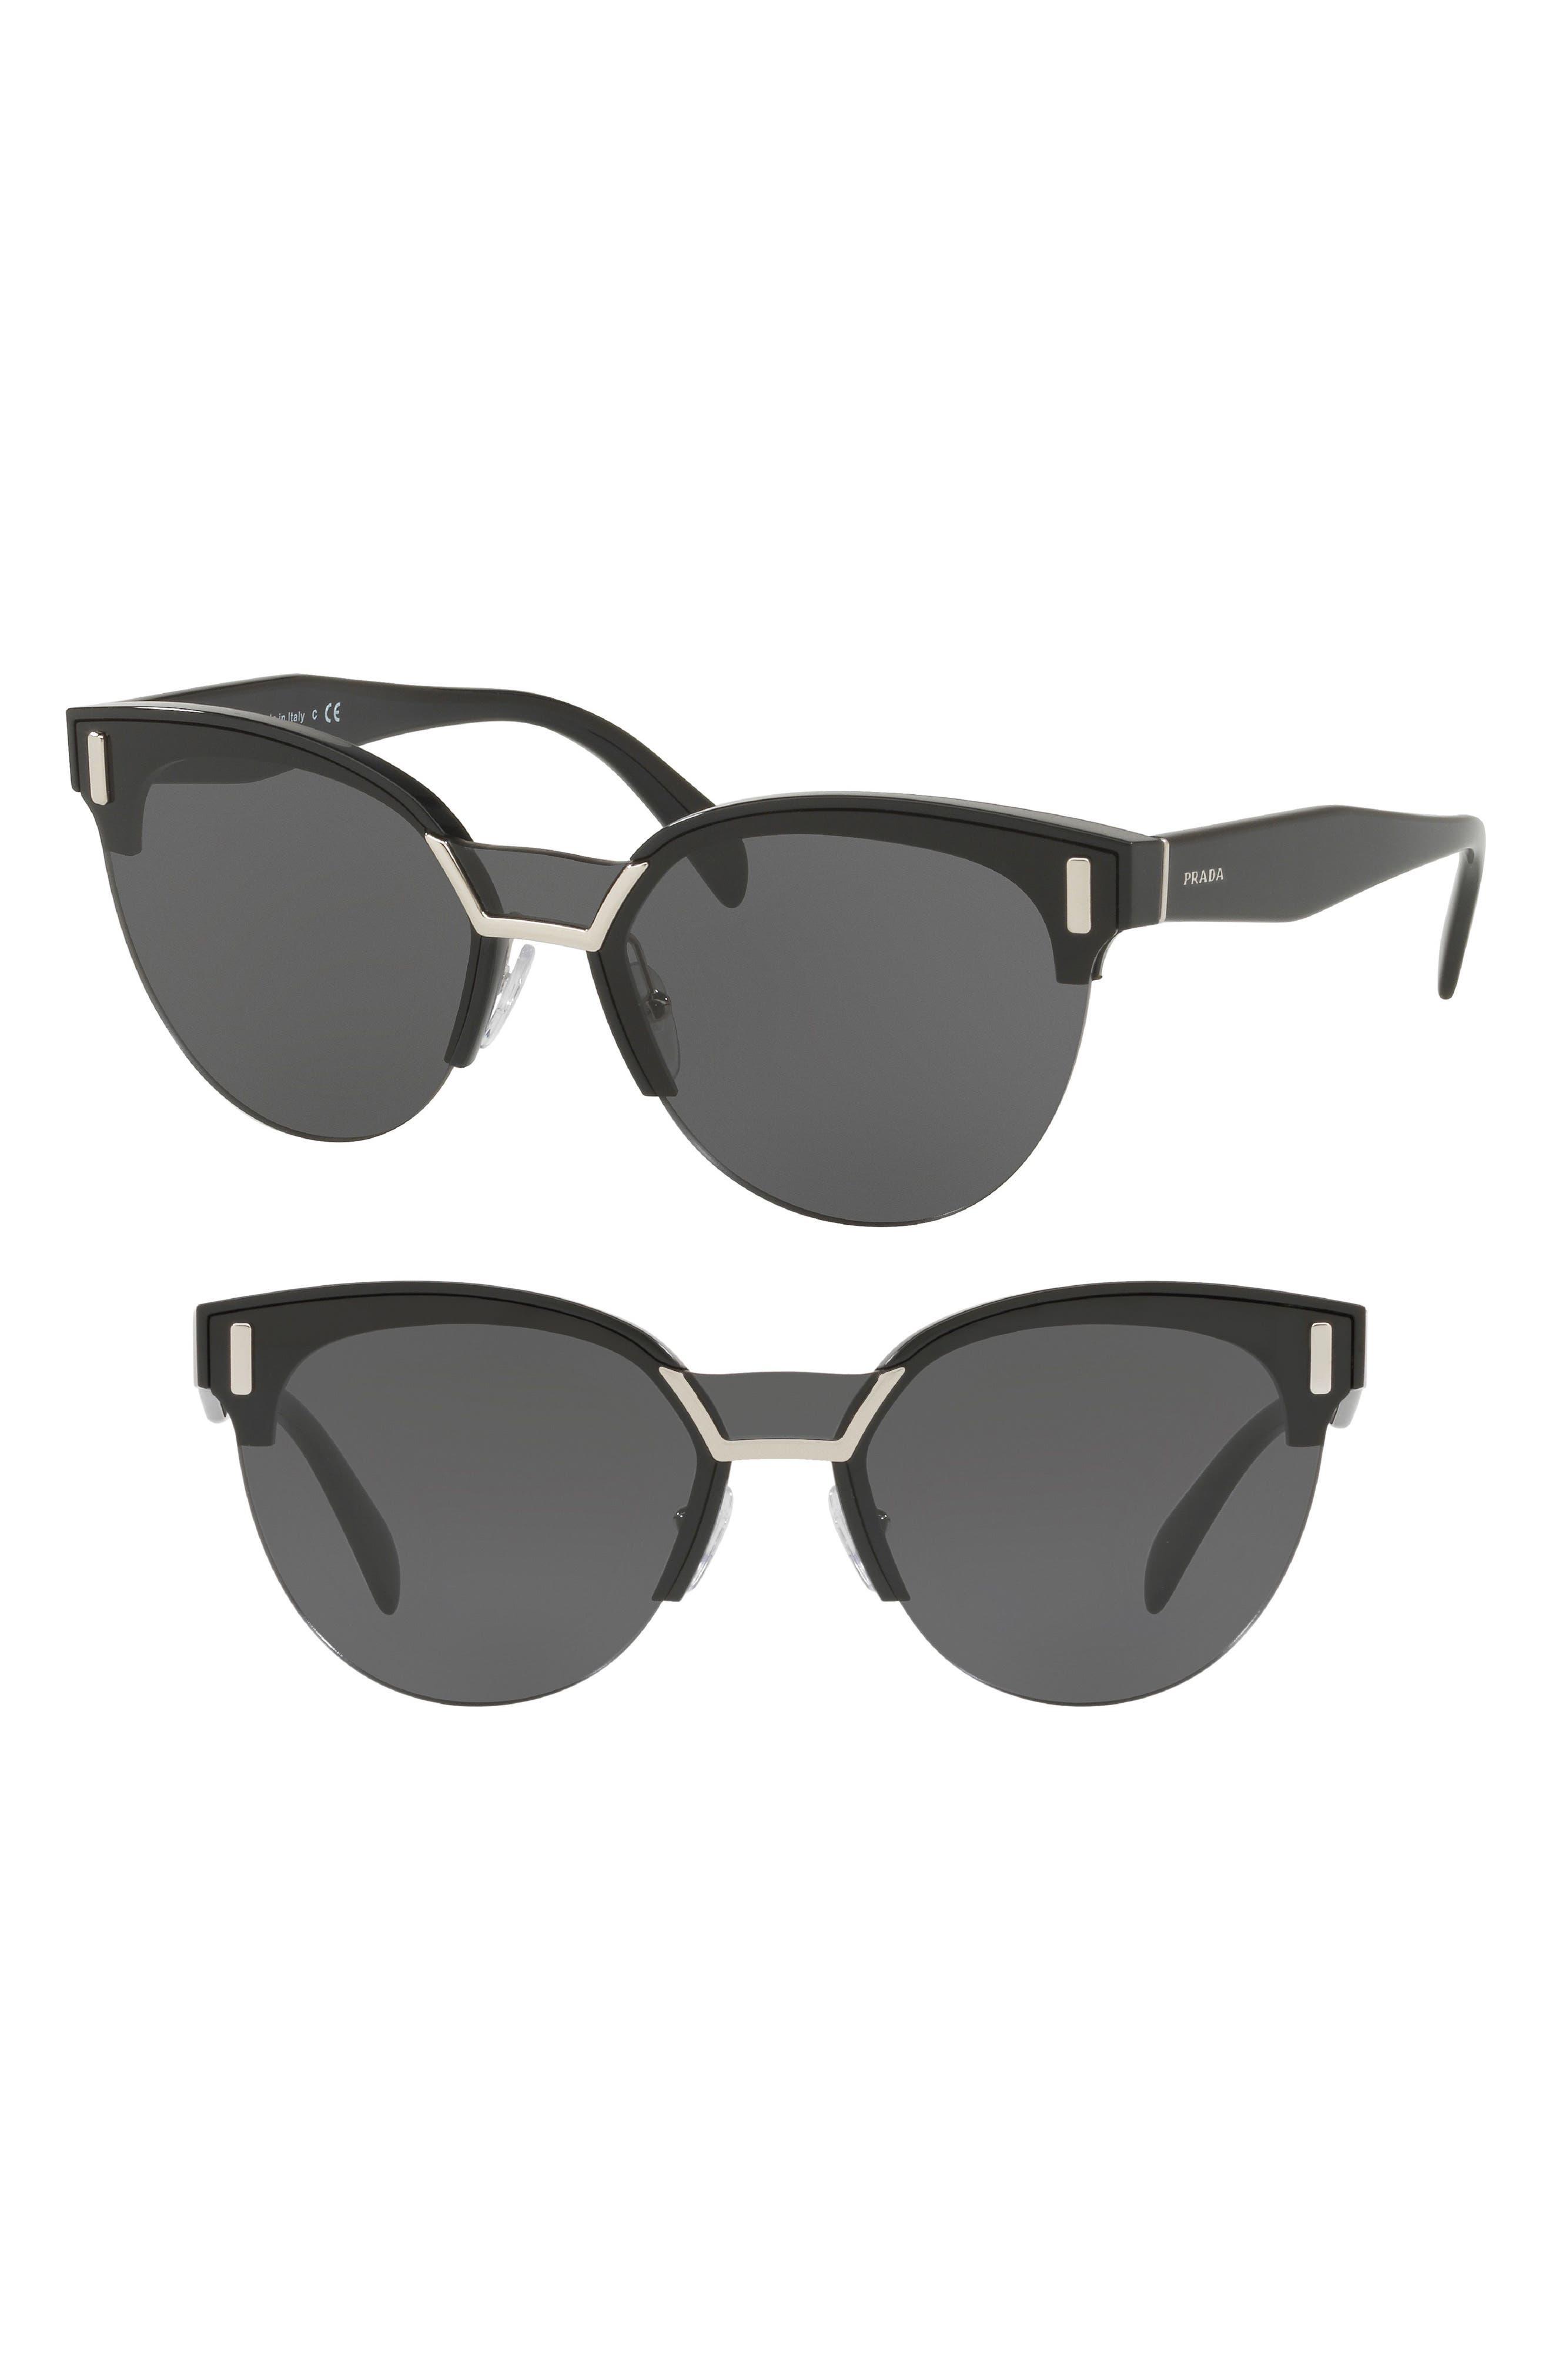 50mm Angular Sunglasses,                         Main,                         color, Black